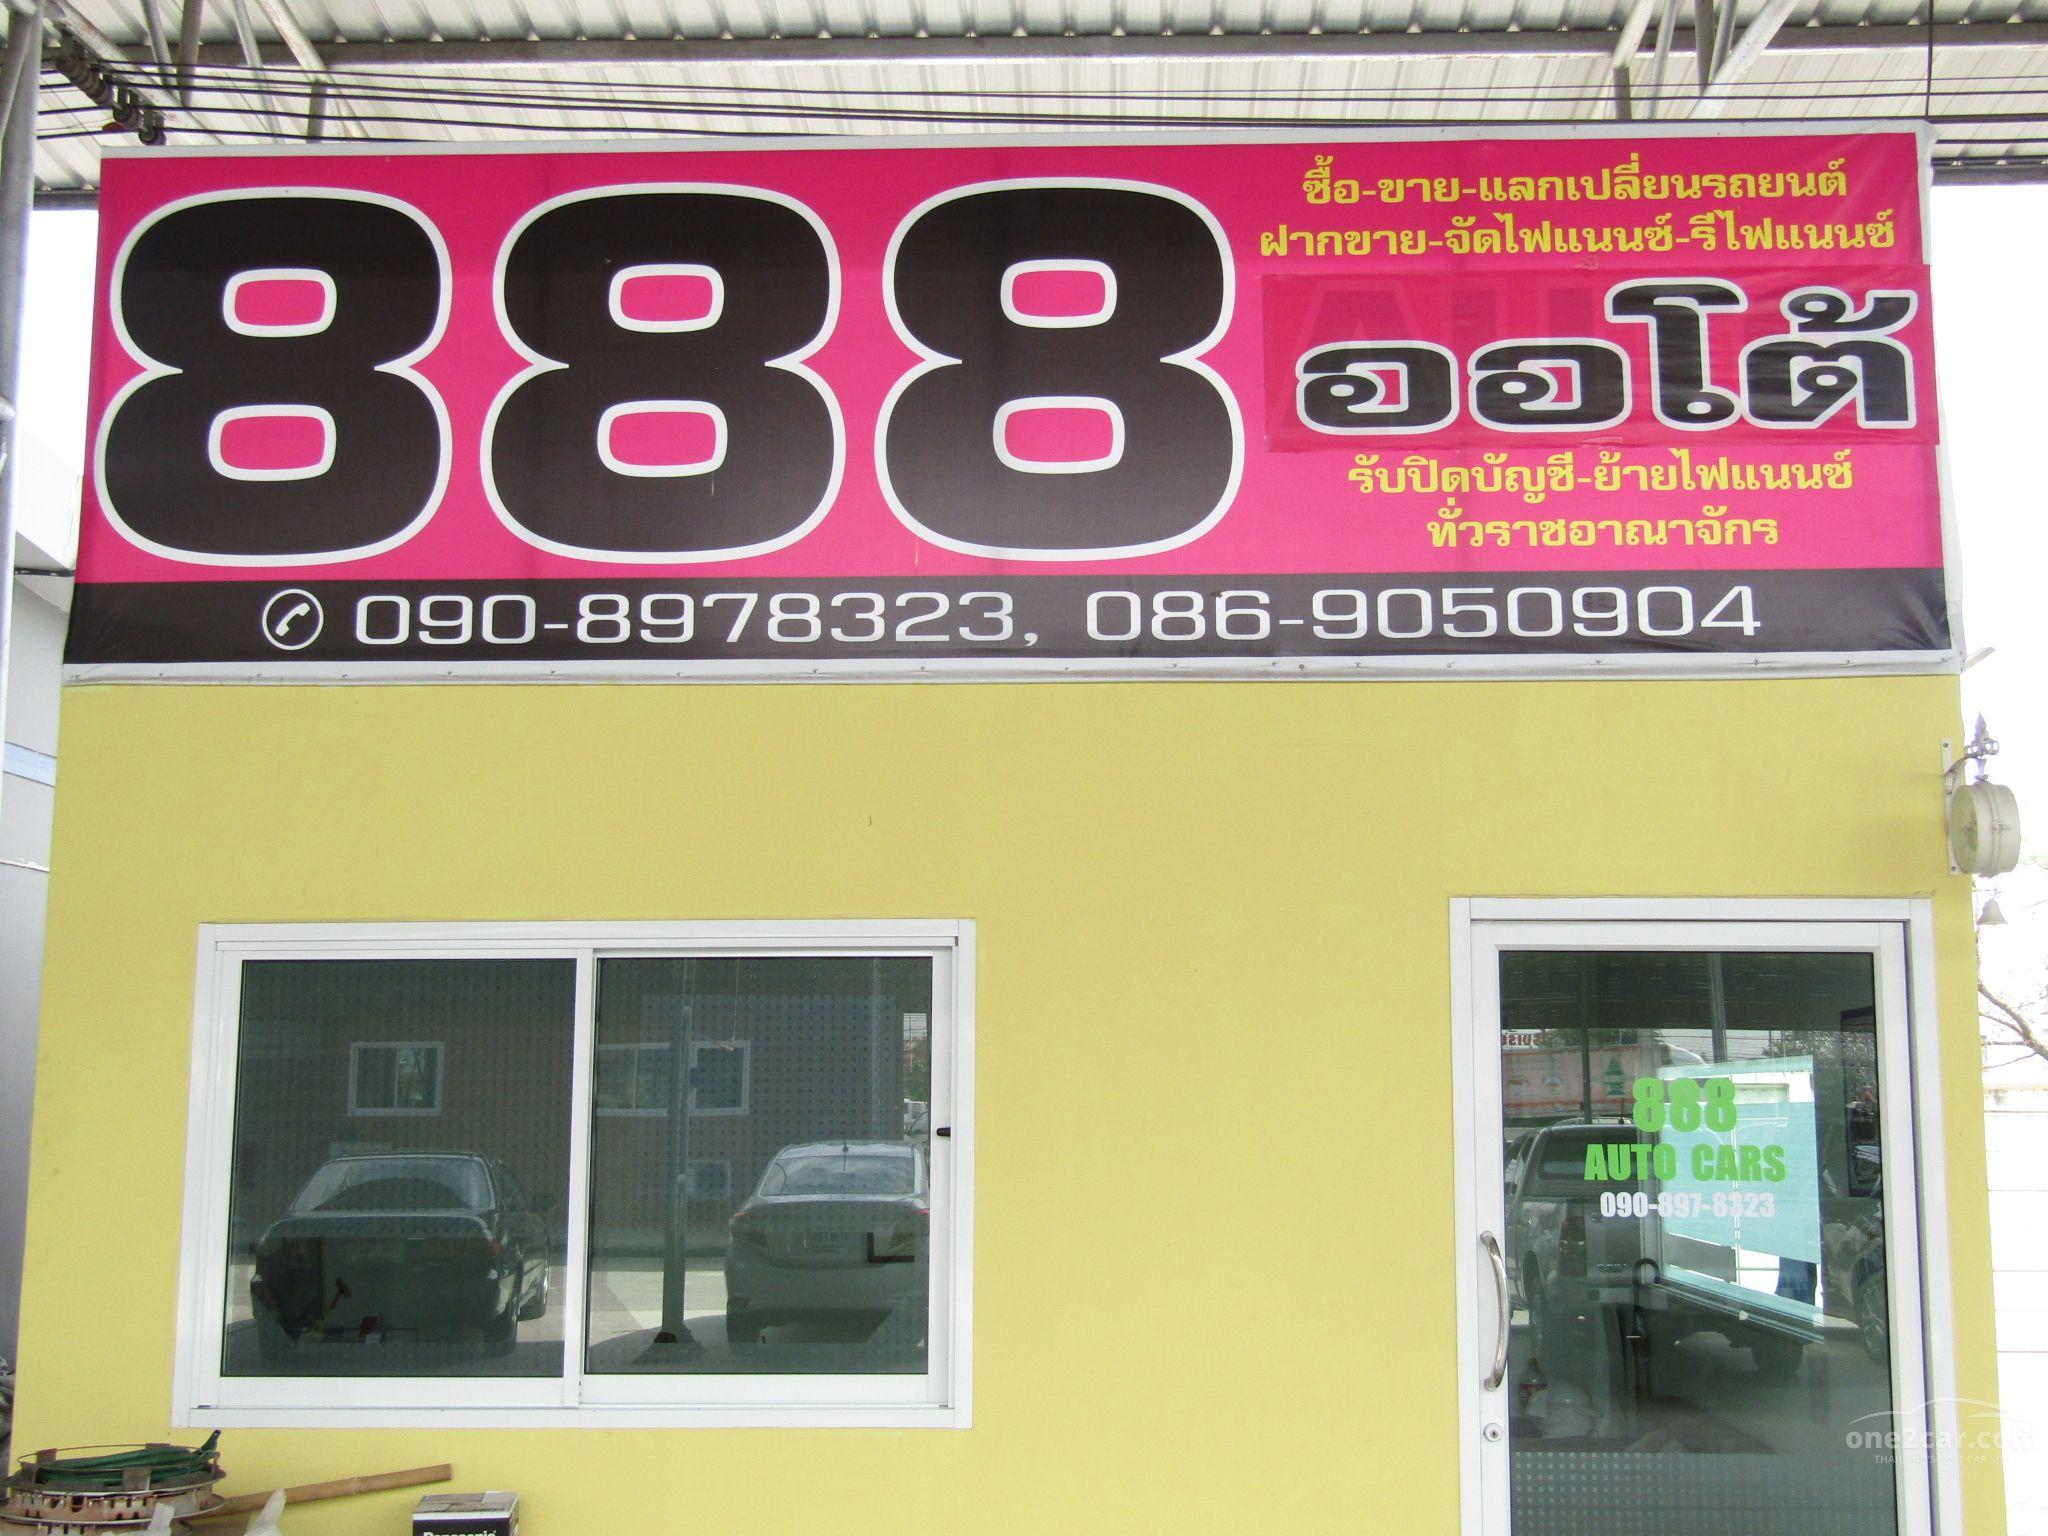 888 AUTO CAR